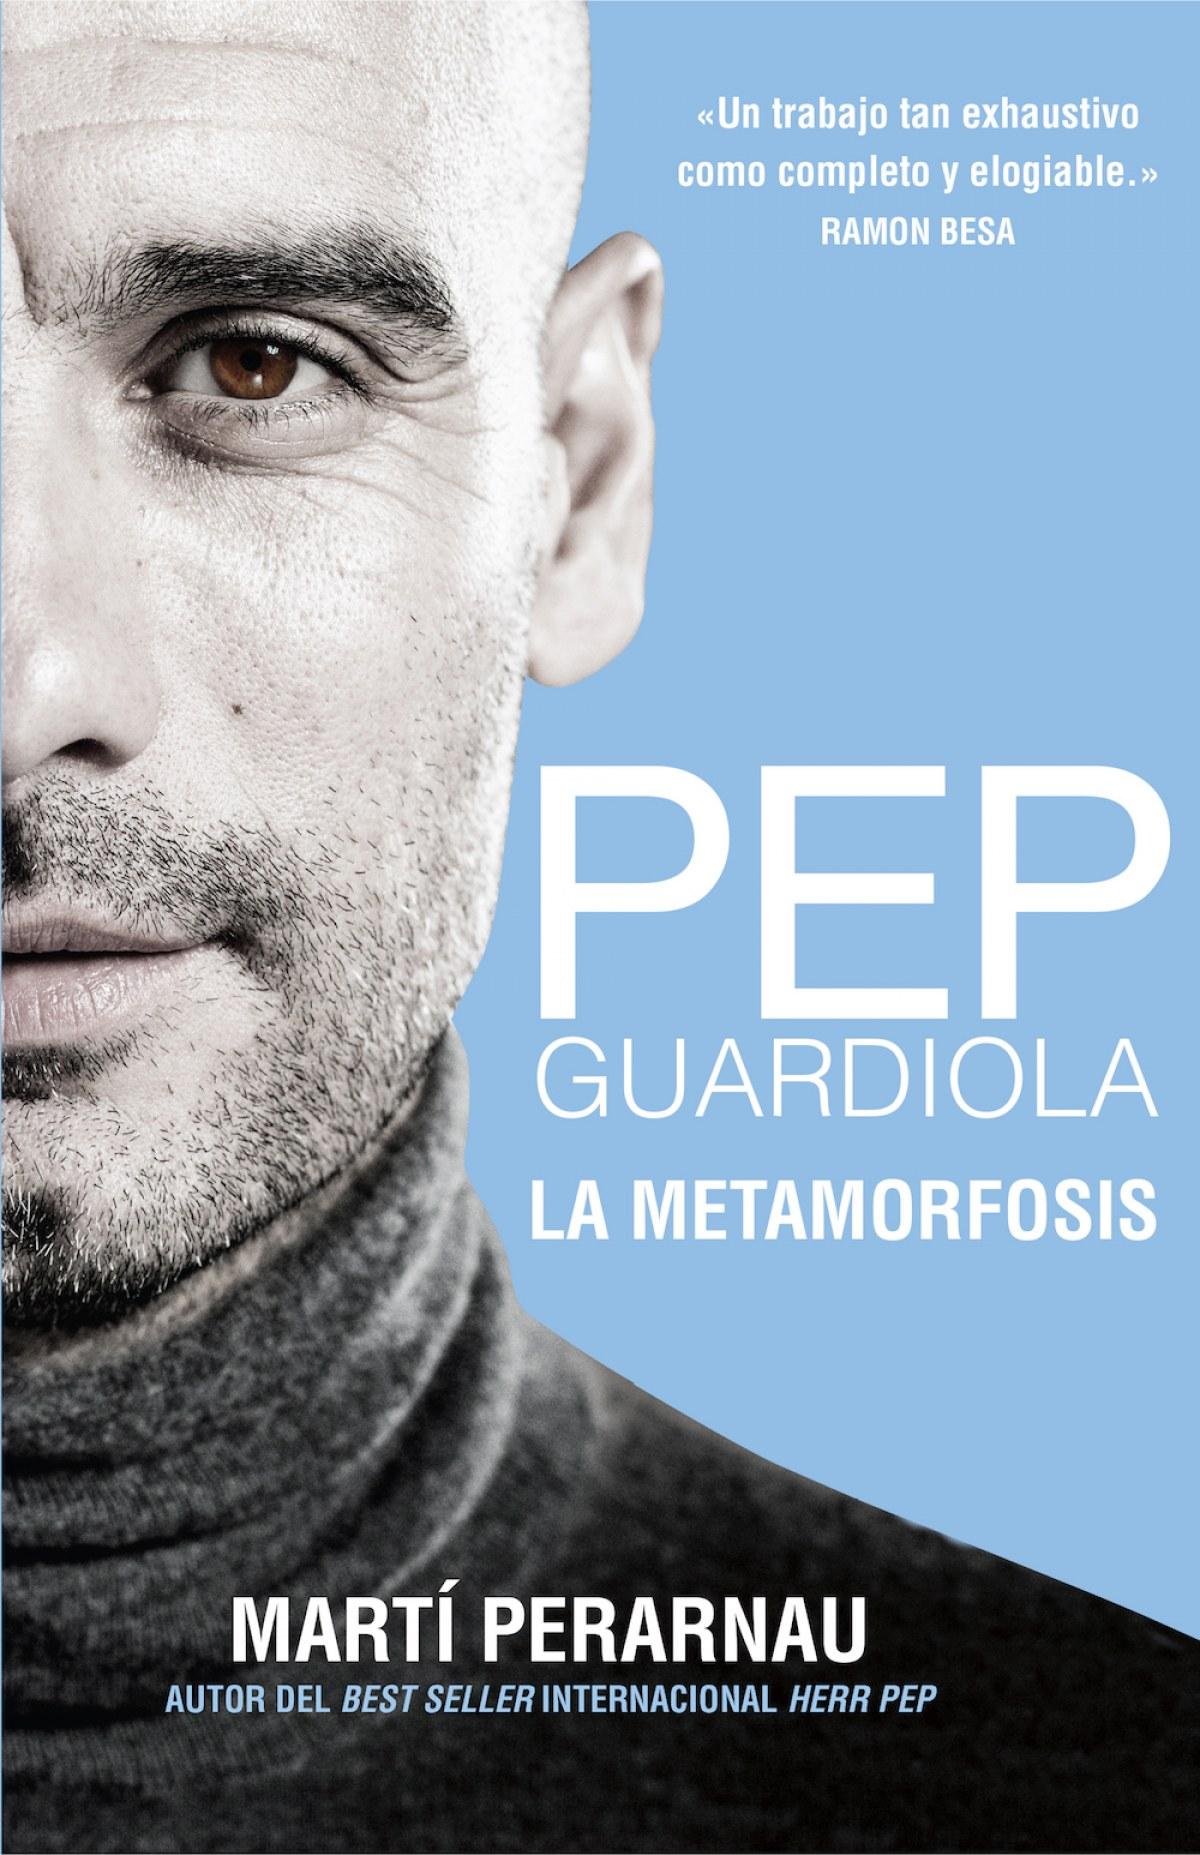 Pep guardiola 9788494425615